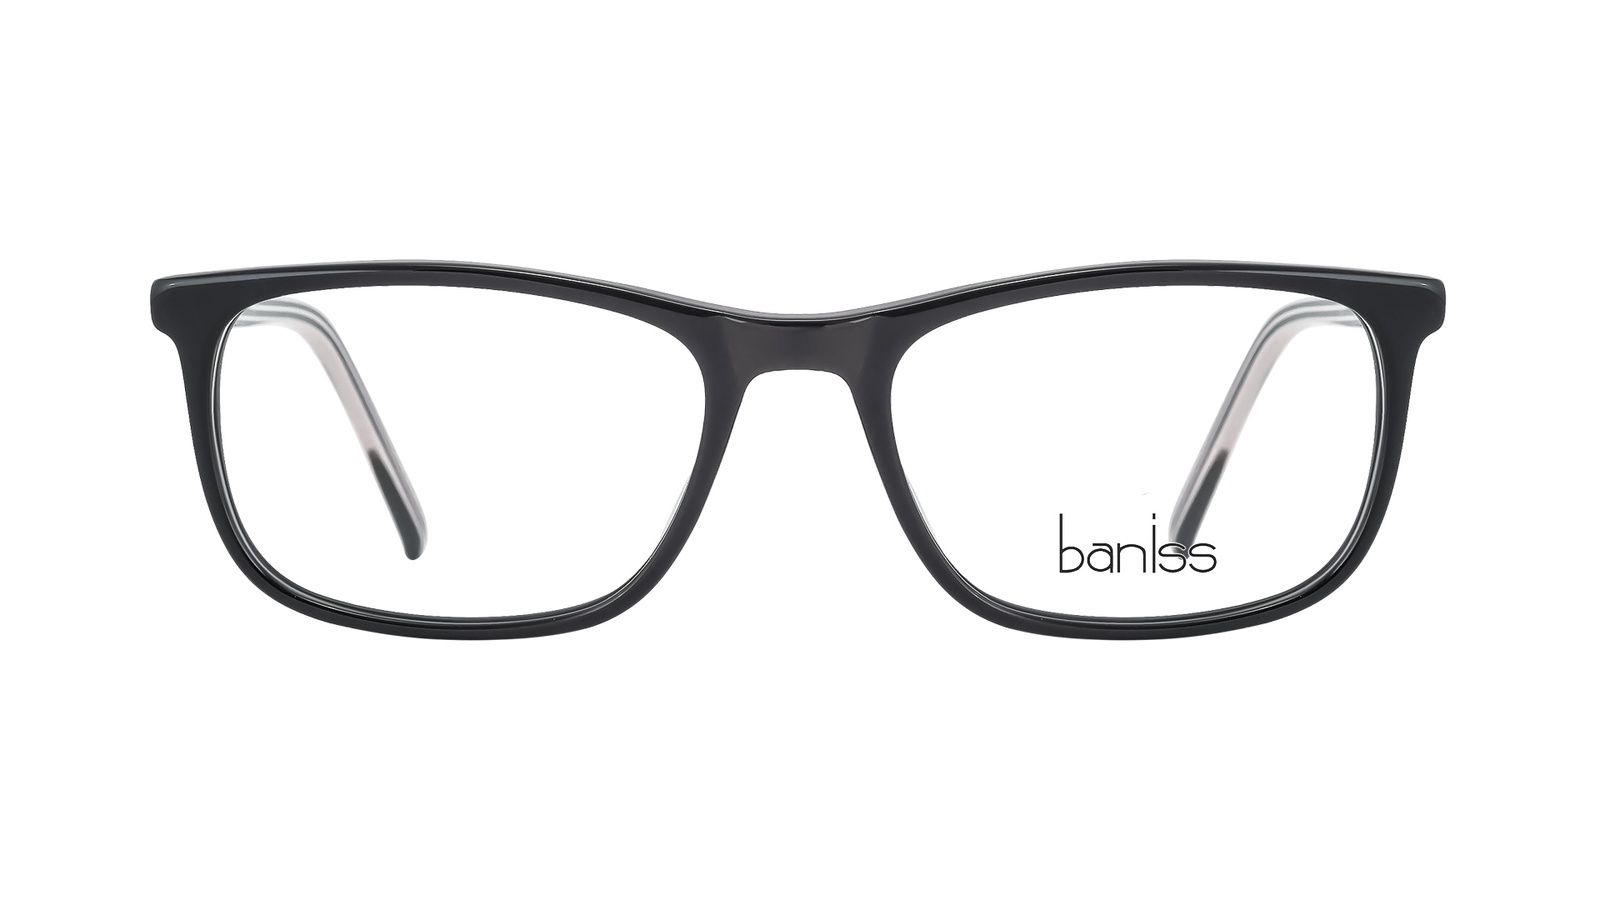 Оправа для очков, BANISS, пластик, BS8023 C01